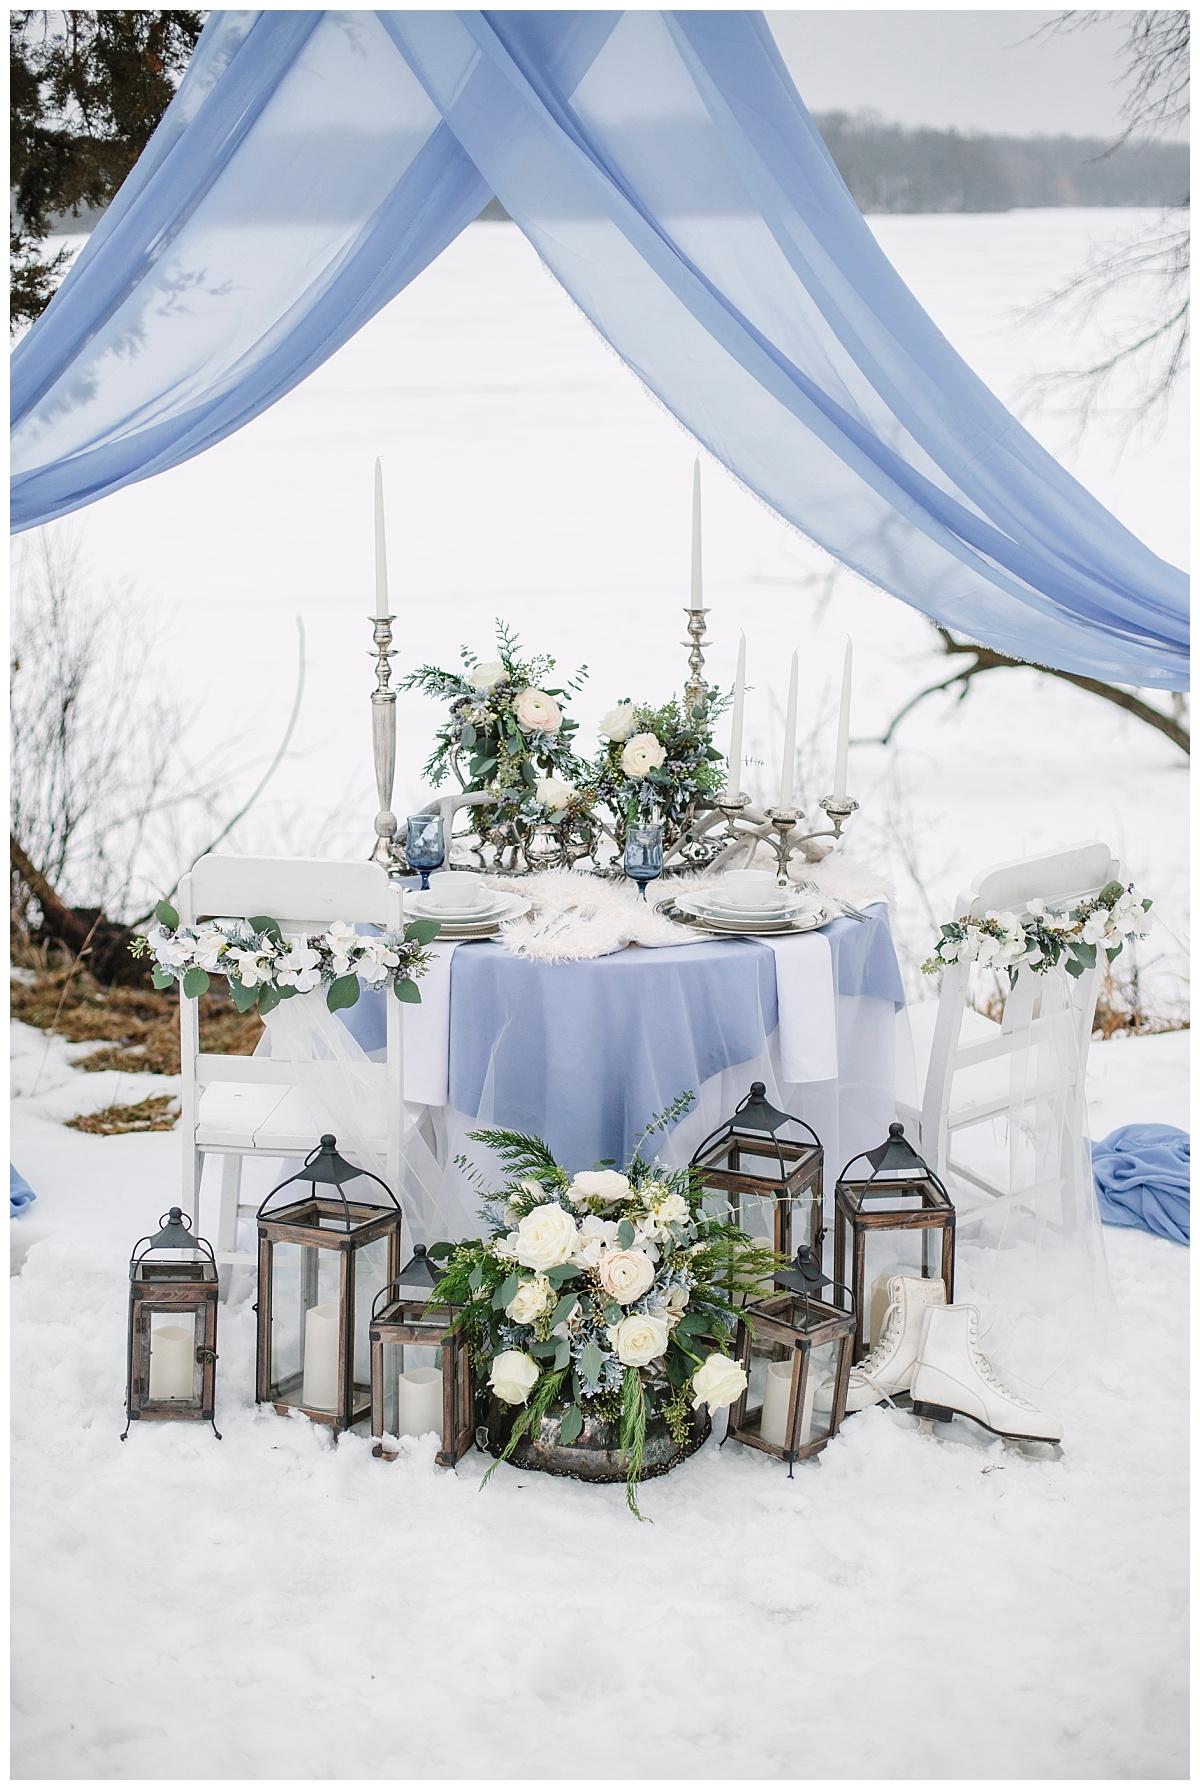 bphotography_winterwedding_siouxfallsweddingphotographer_0004.jpg